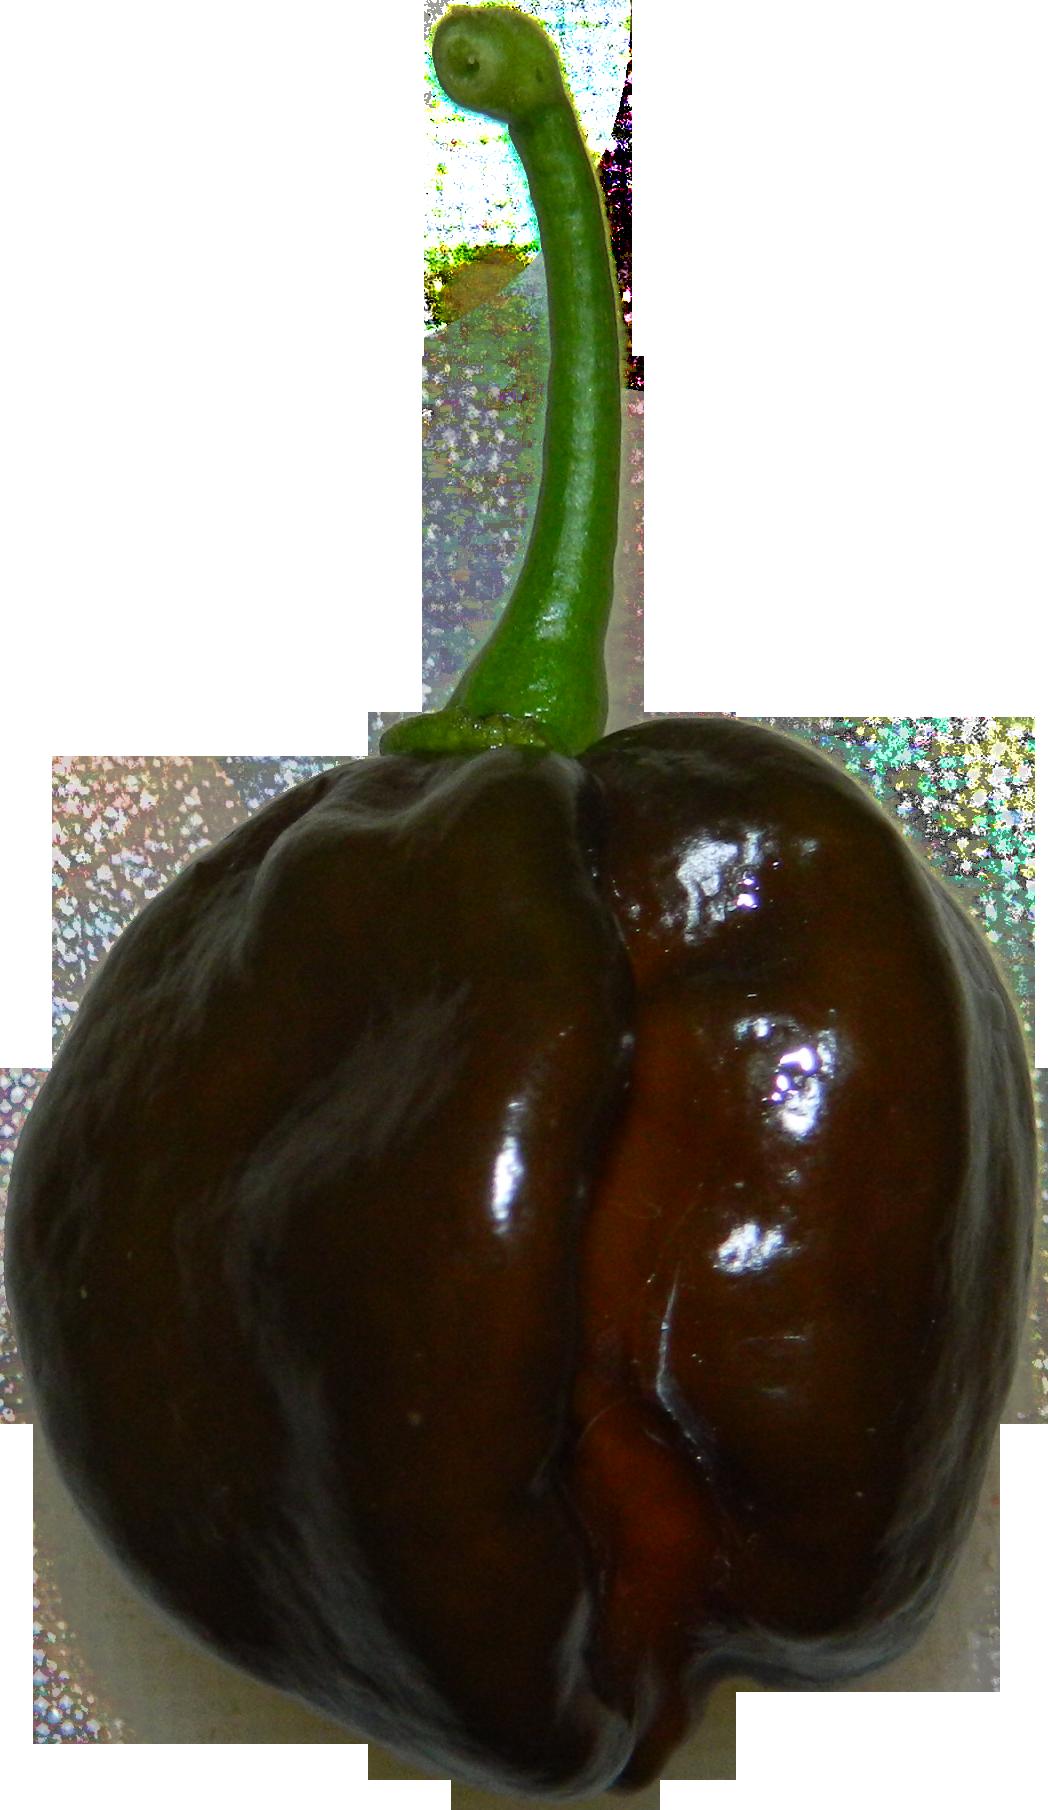 File:Chocolate habanero.png